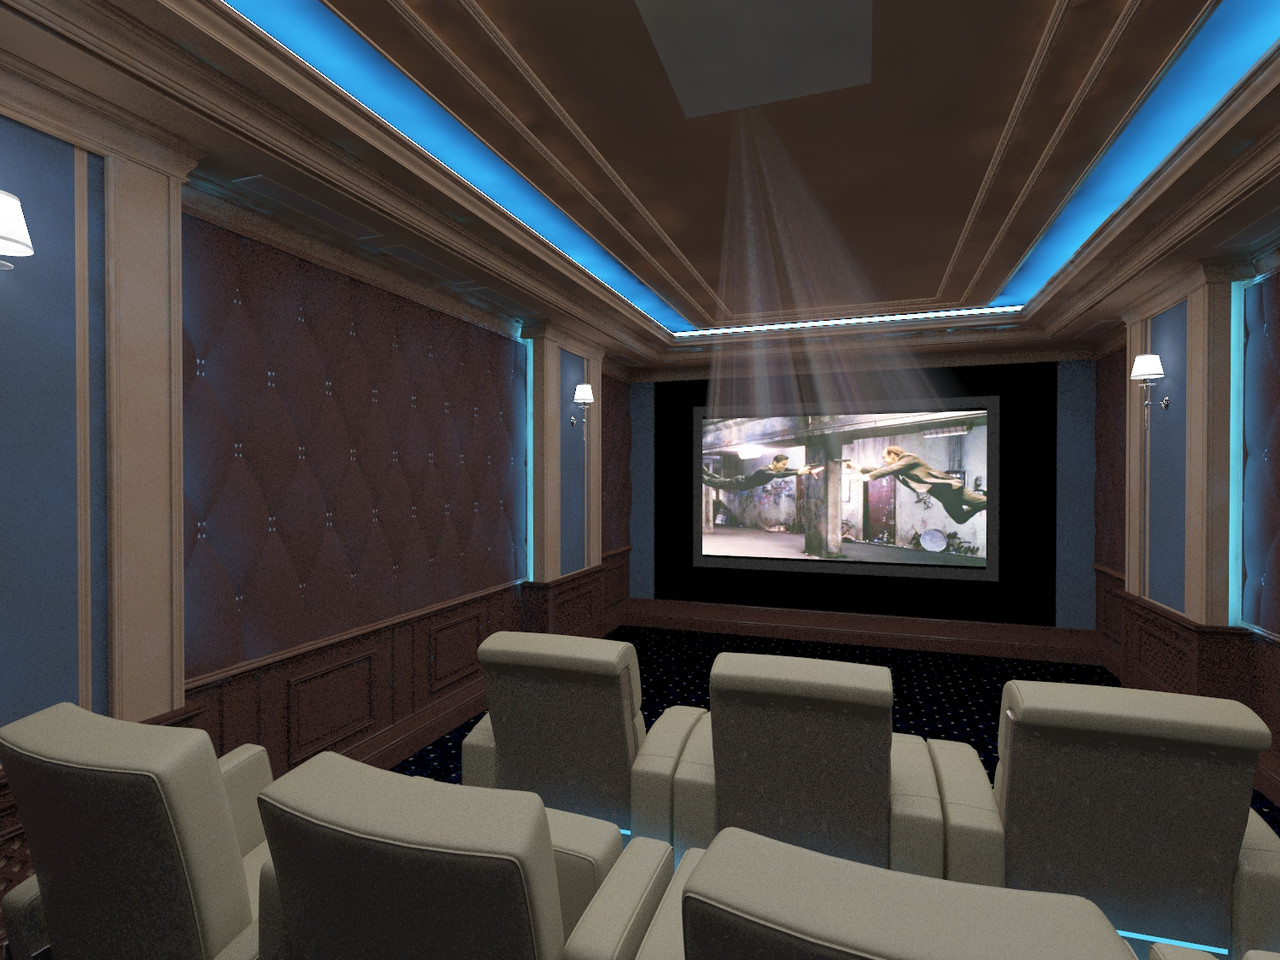 Дизайн домашнього кінотеатру. Дизайн кінозалу.